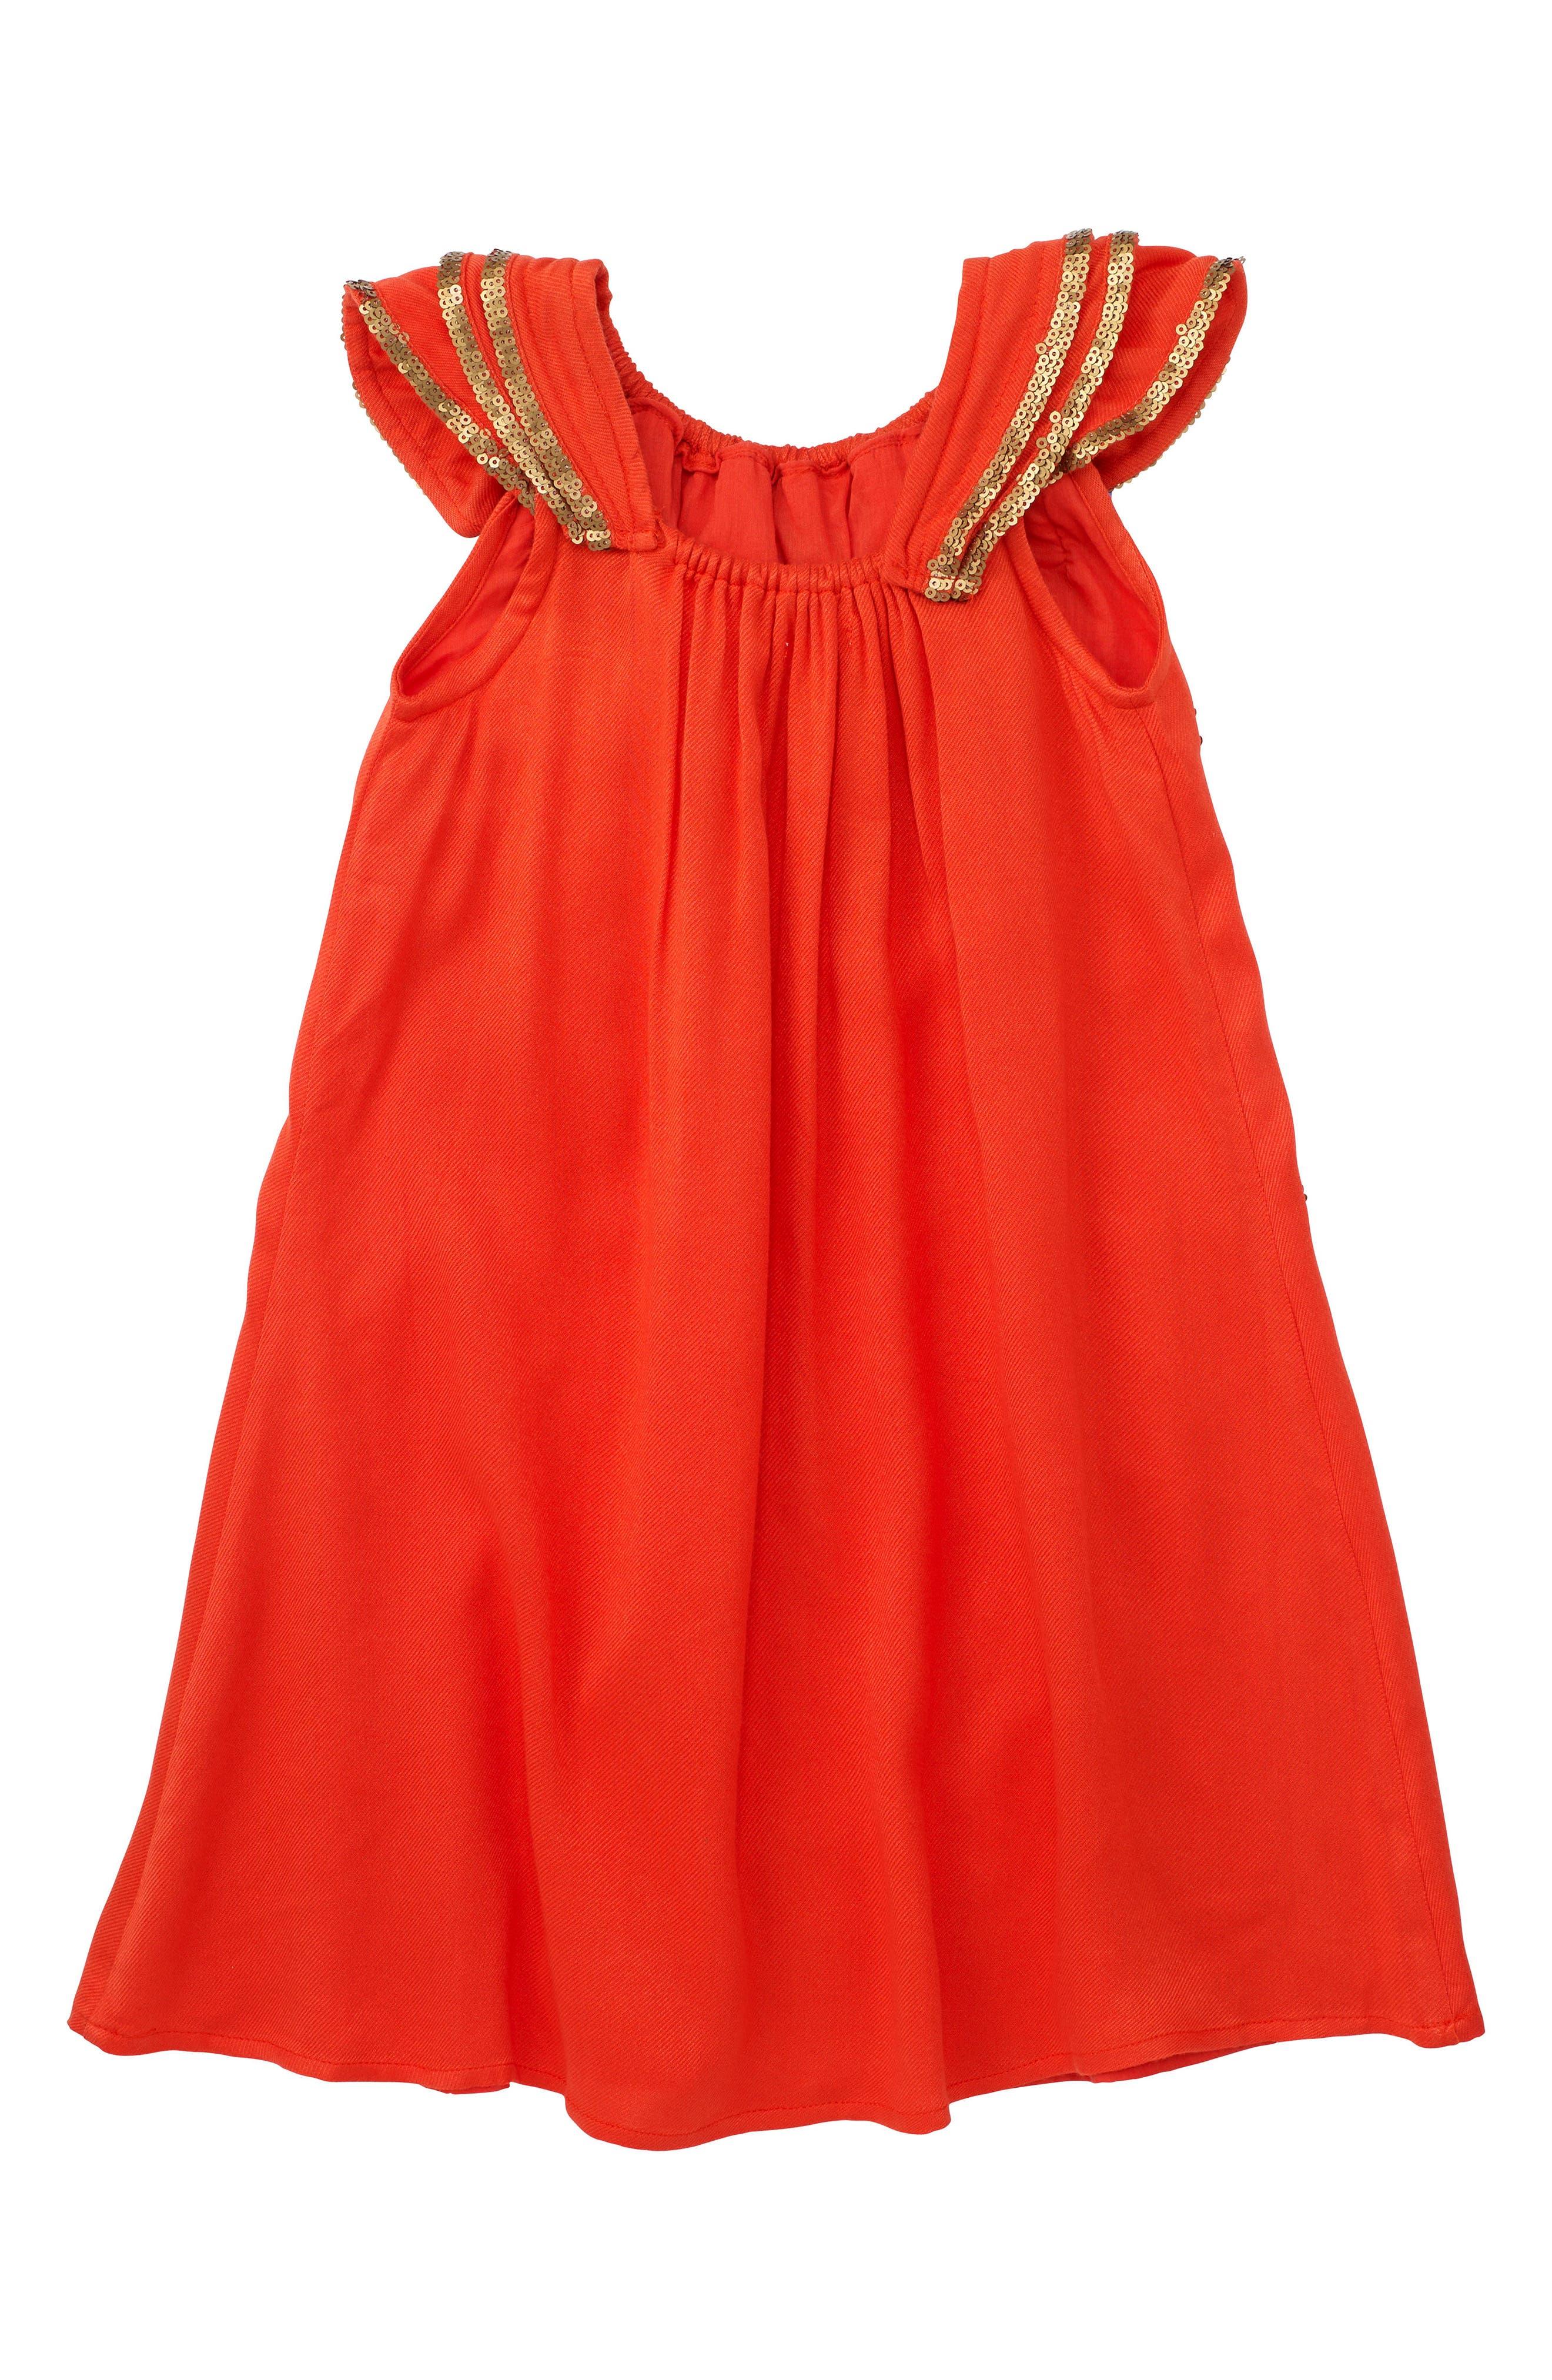 Dahlia Flutter Sleeve Dress,                             Alternate thumbnail 4, color,                             Coral